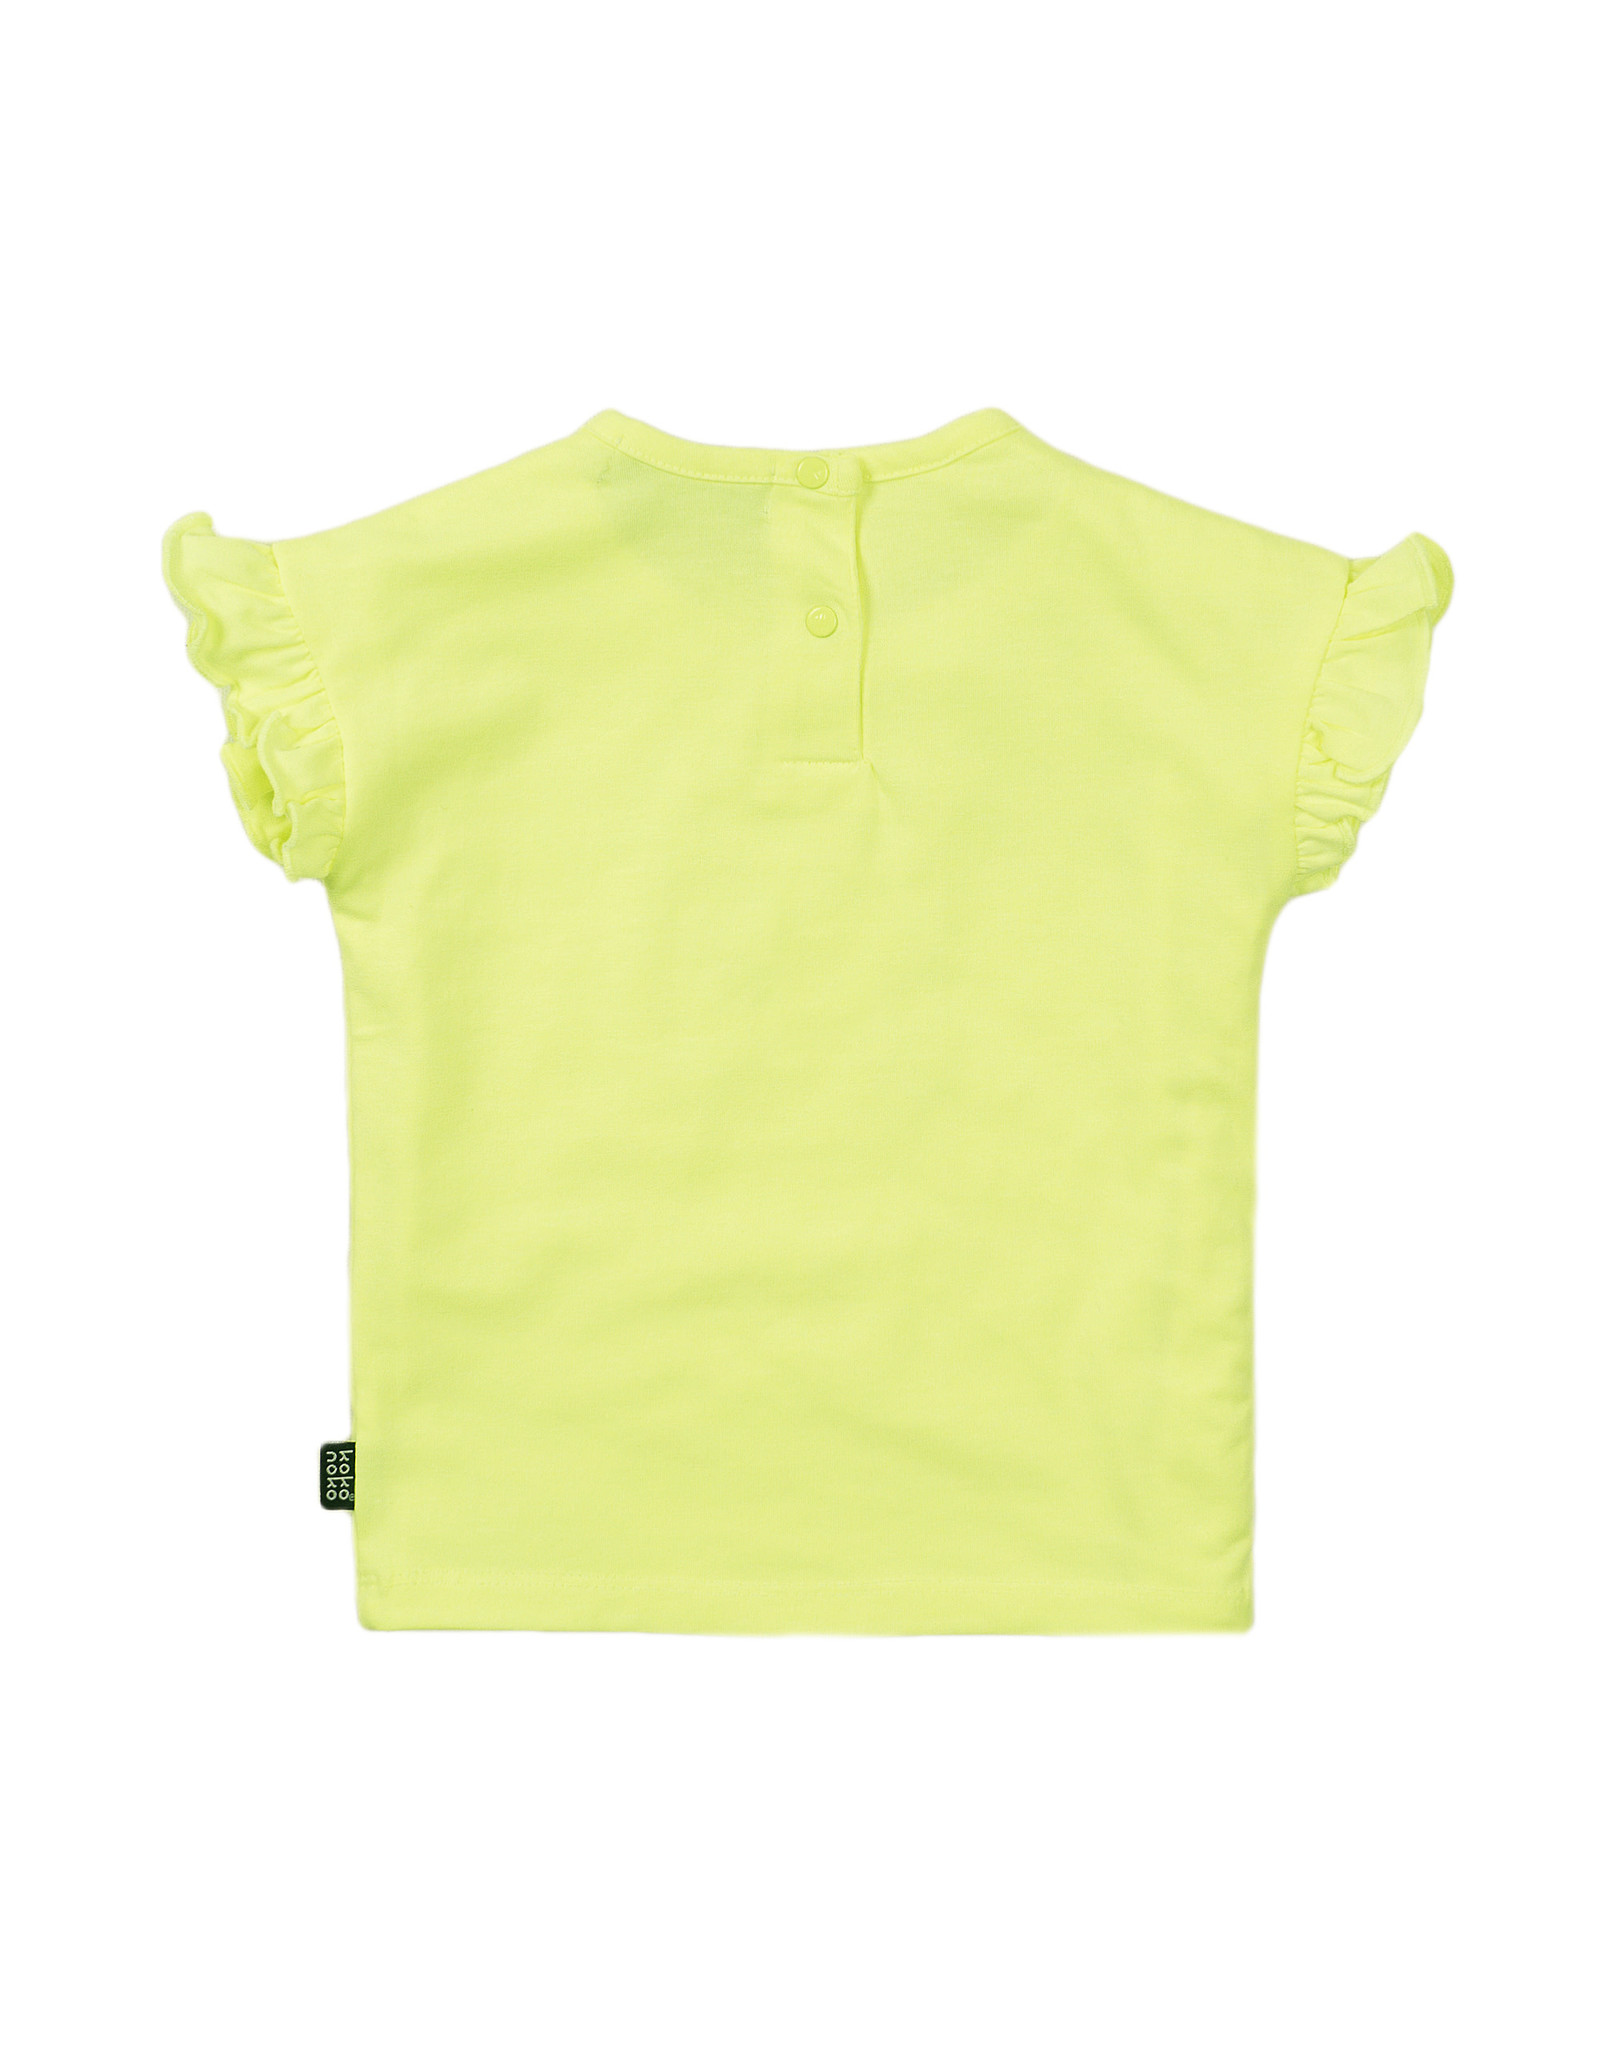 Koko Noko Koko Noko meisjes t-shirt Word Traveller Neon Yellow